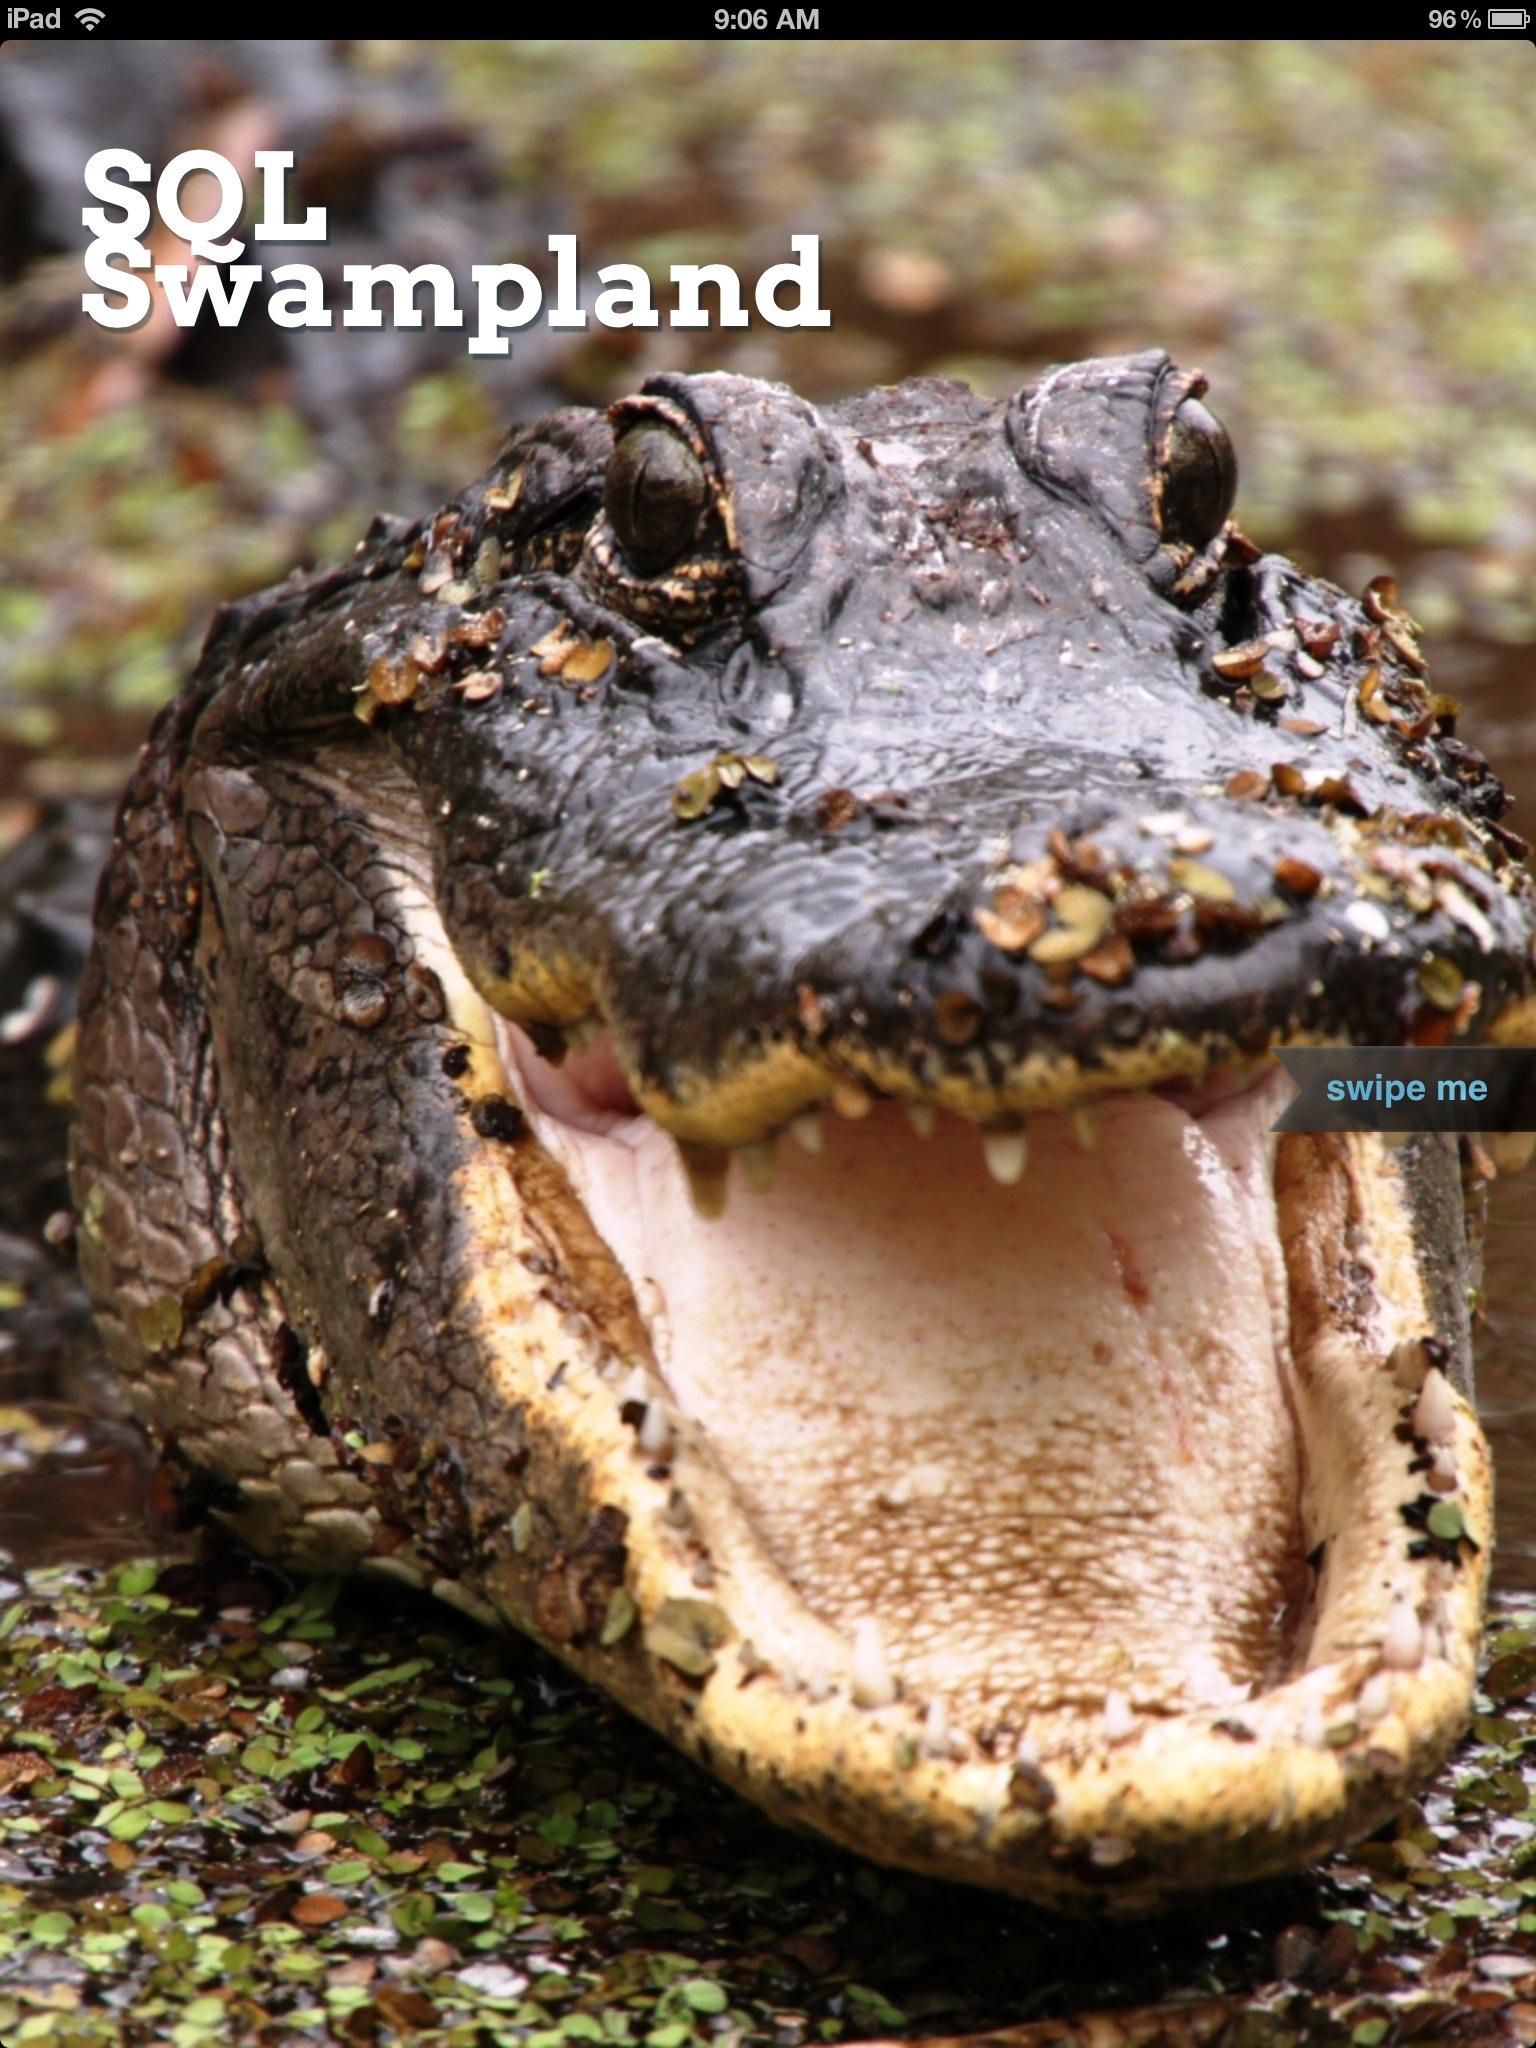 SQL Swampland